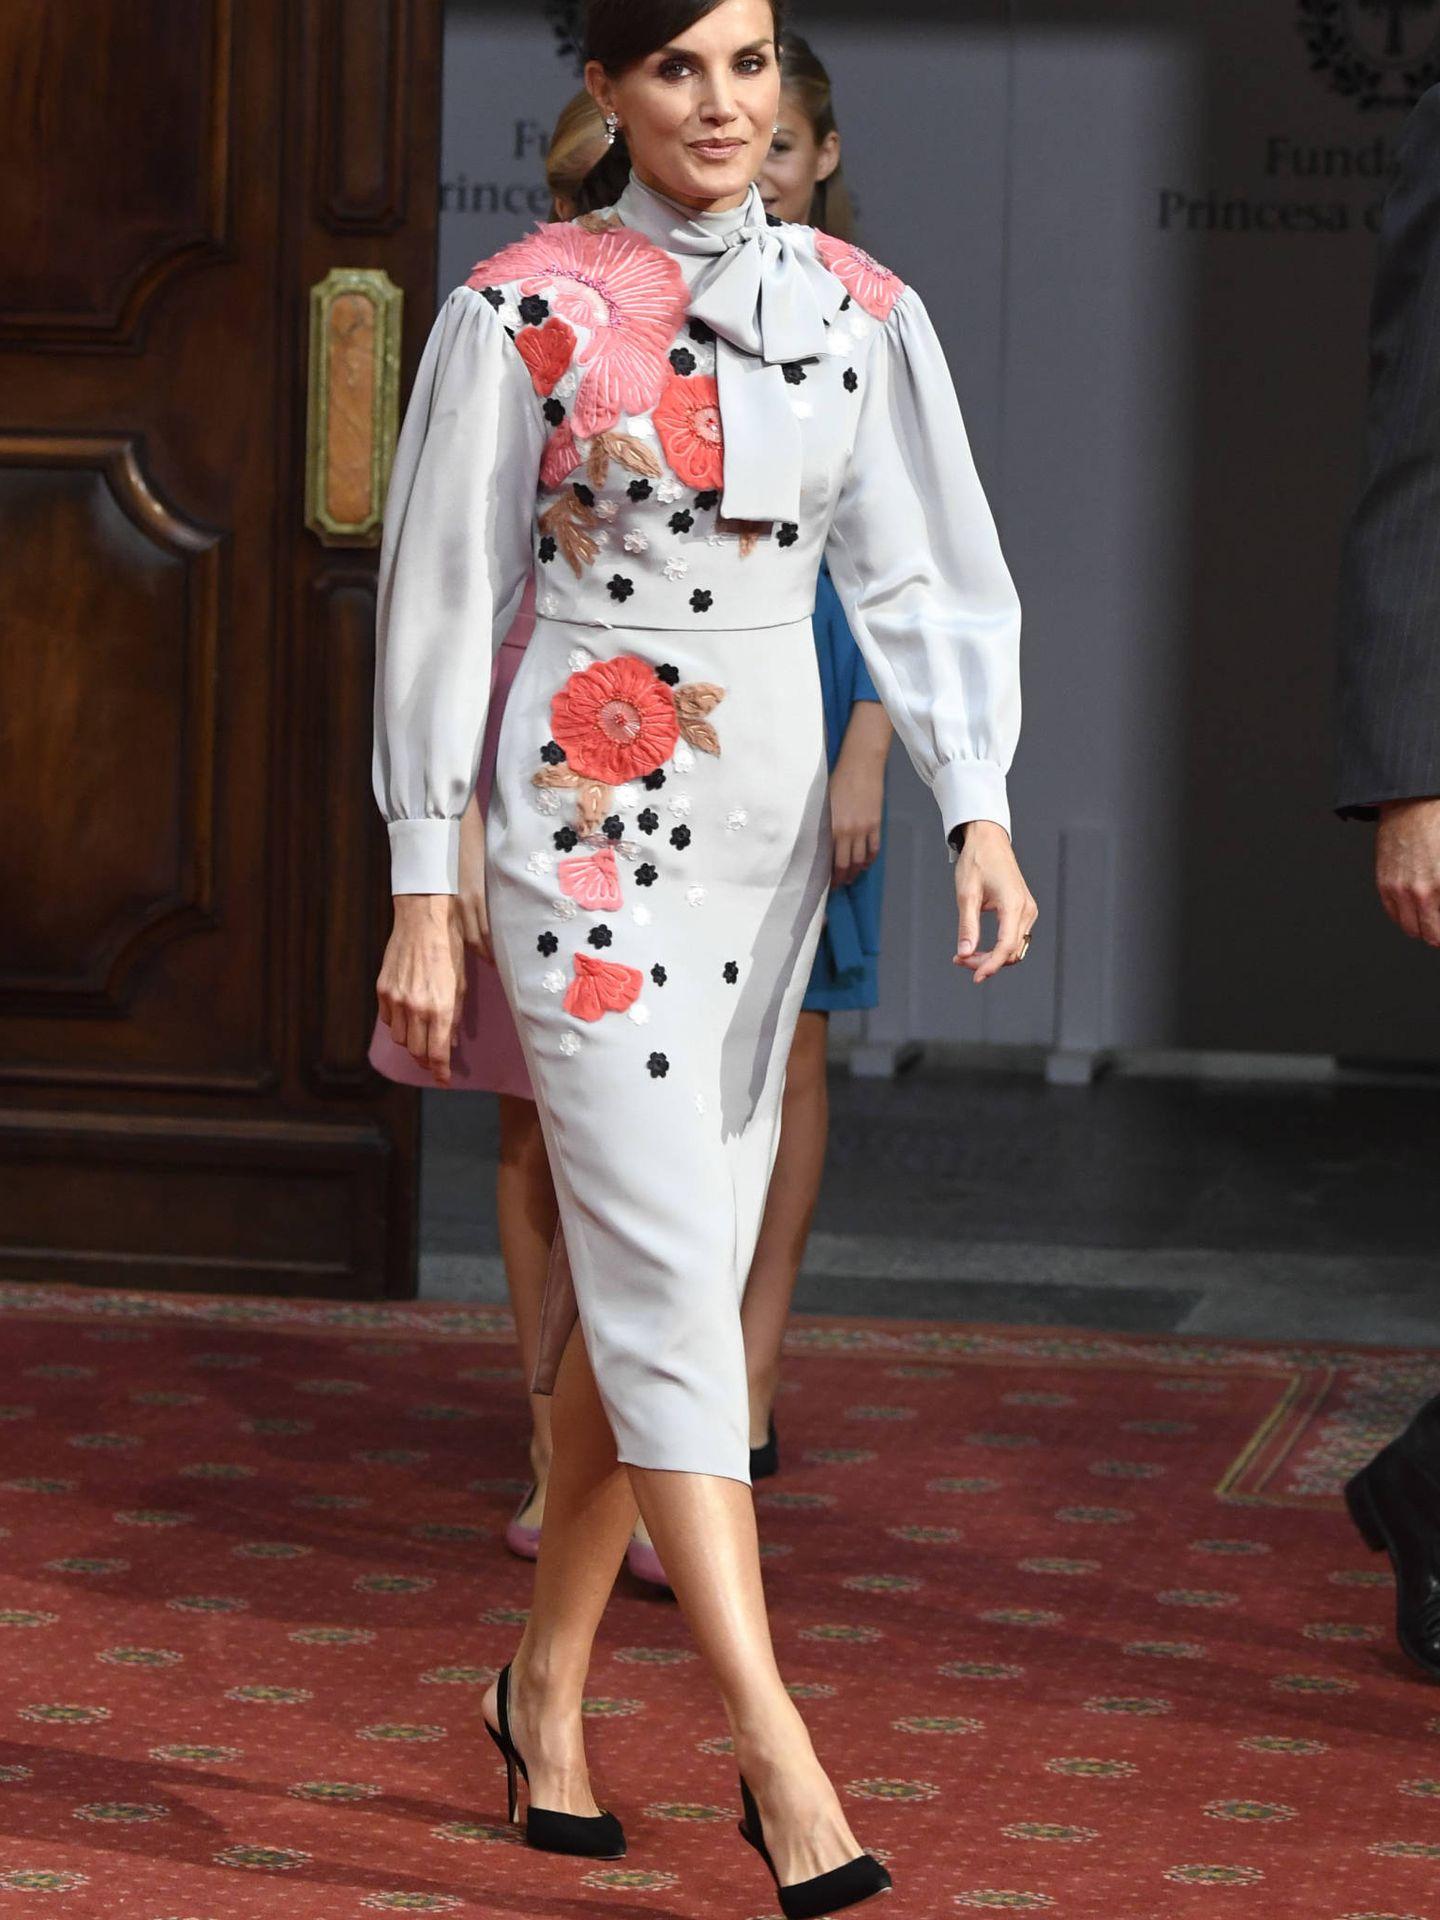 La reina Letizia, este viernes en Oviedo. (Limited Pictures)